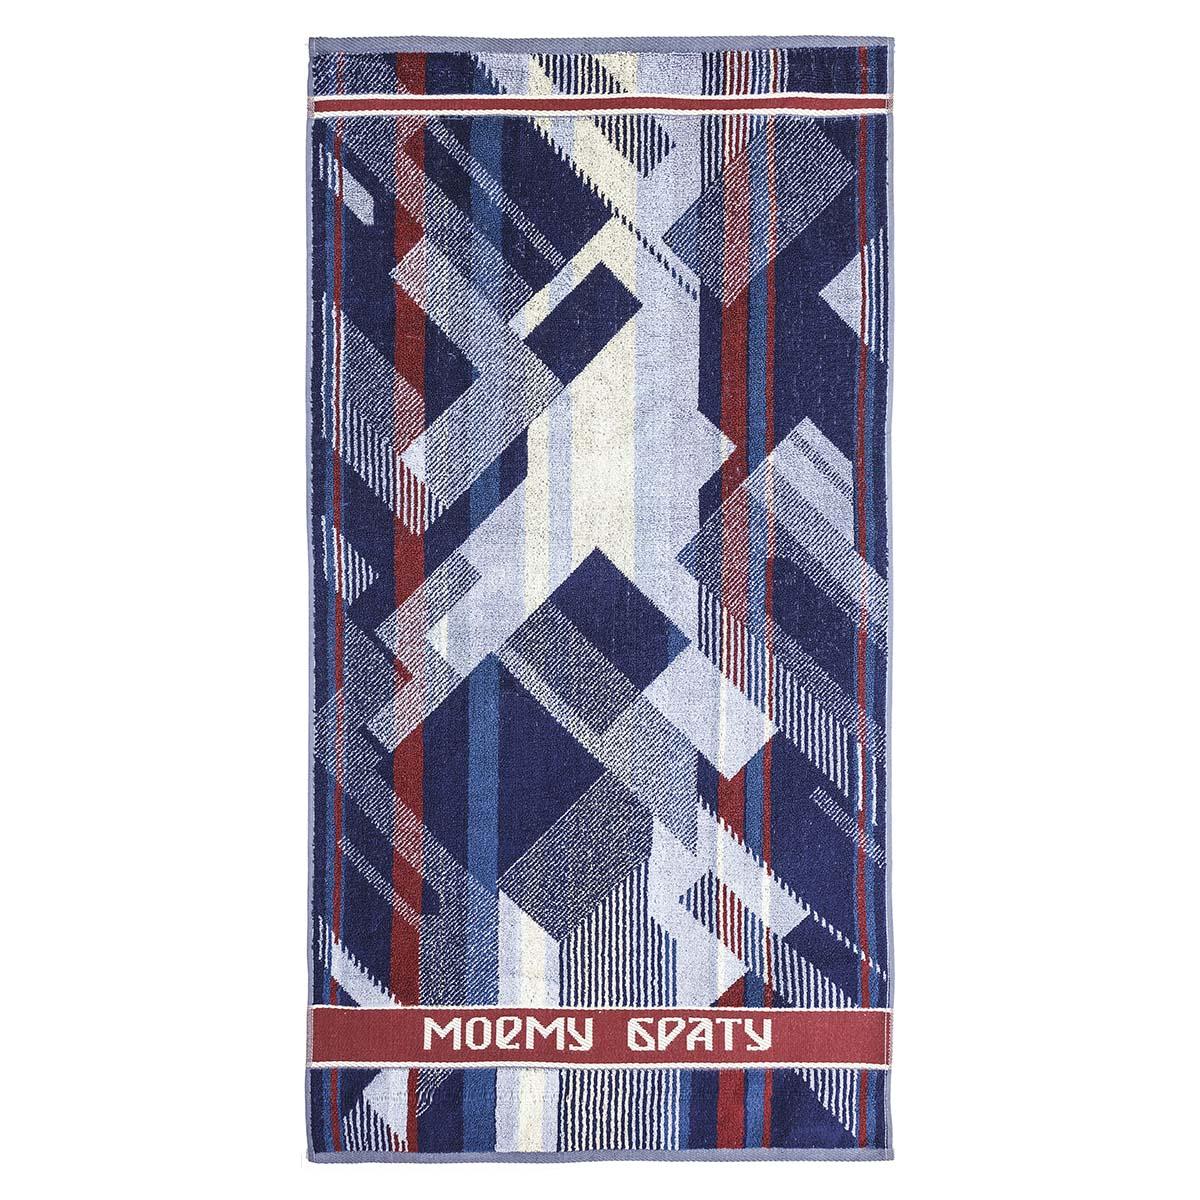 Полотенце Брату, размер 50х100 см.Махровые полотенца<br>Плотность ткани:420 г/кв. м<br><br>Тип: Полотенце<br>Размер: 50х100<br>Материал: Махра